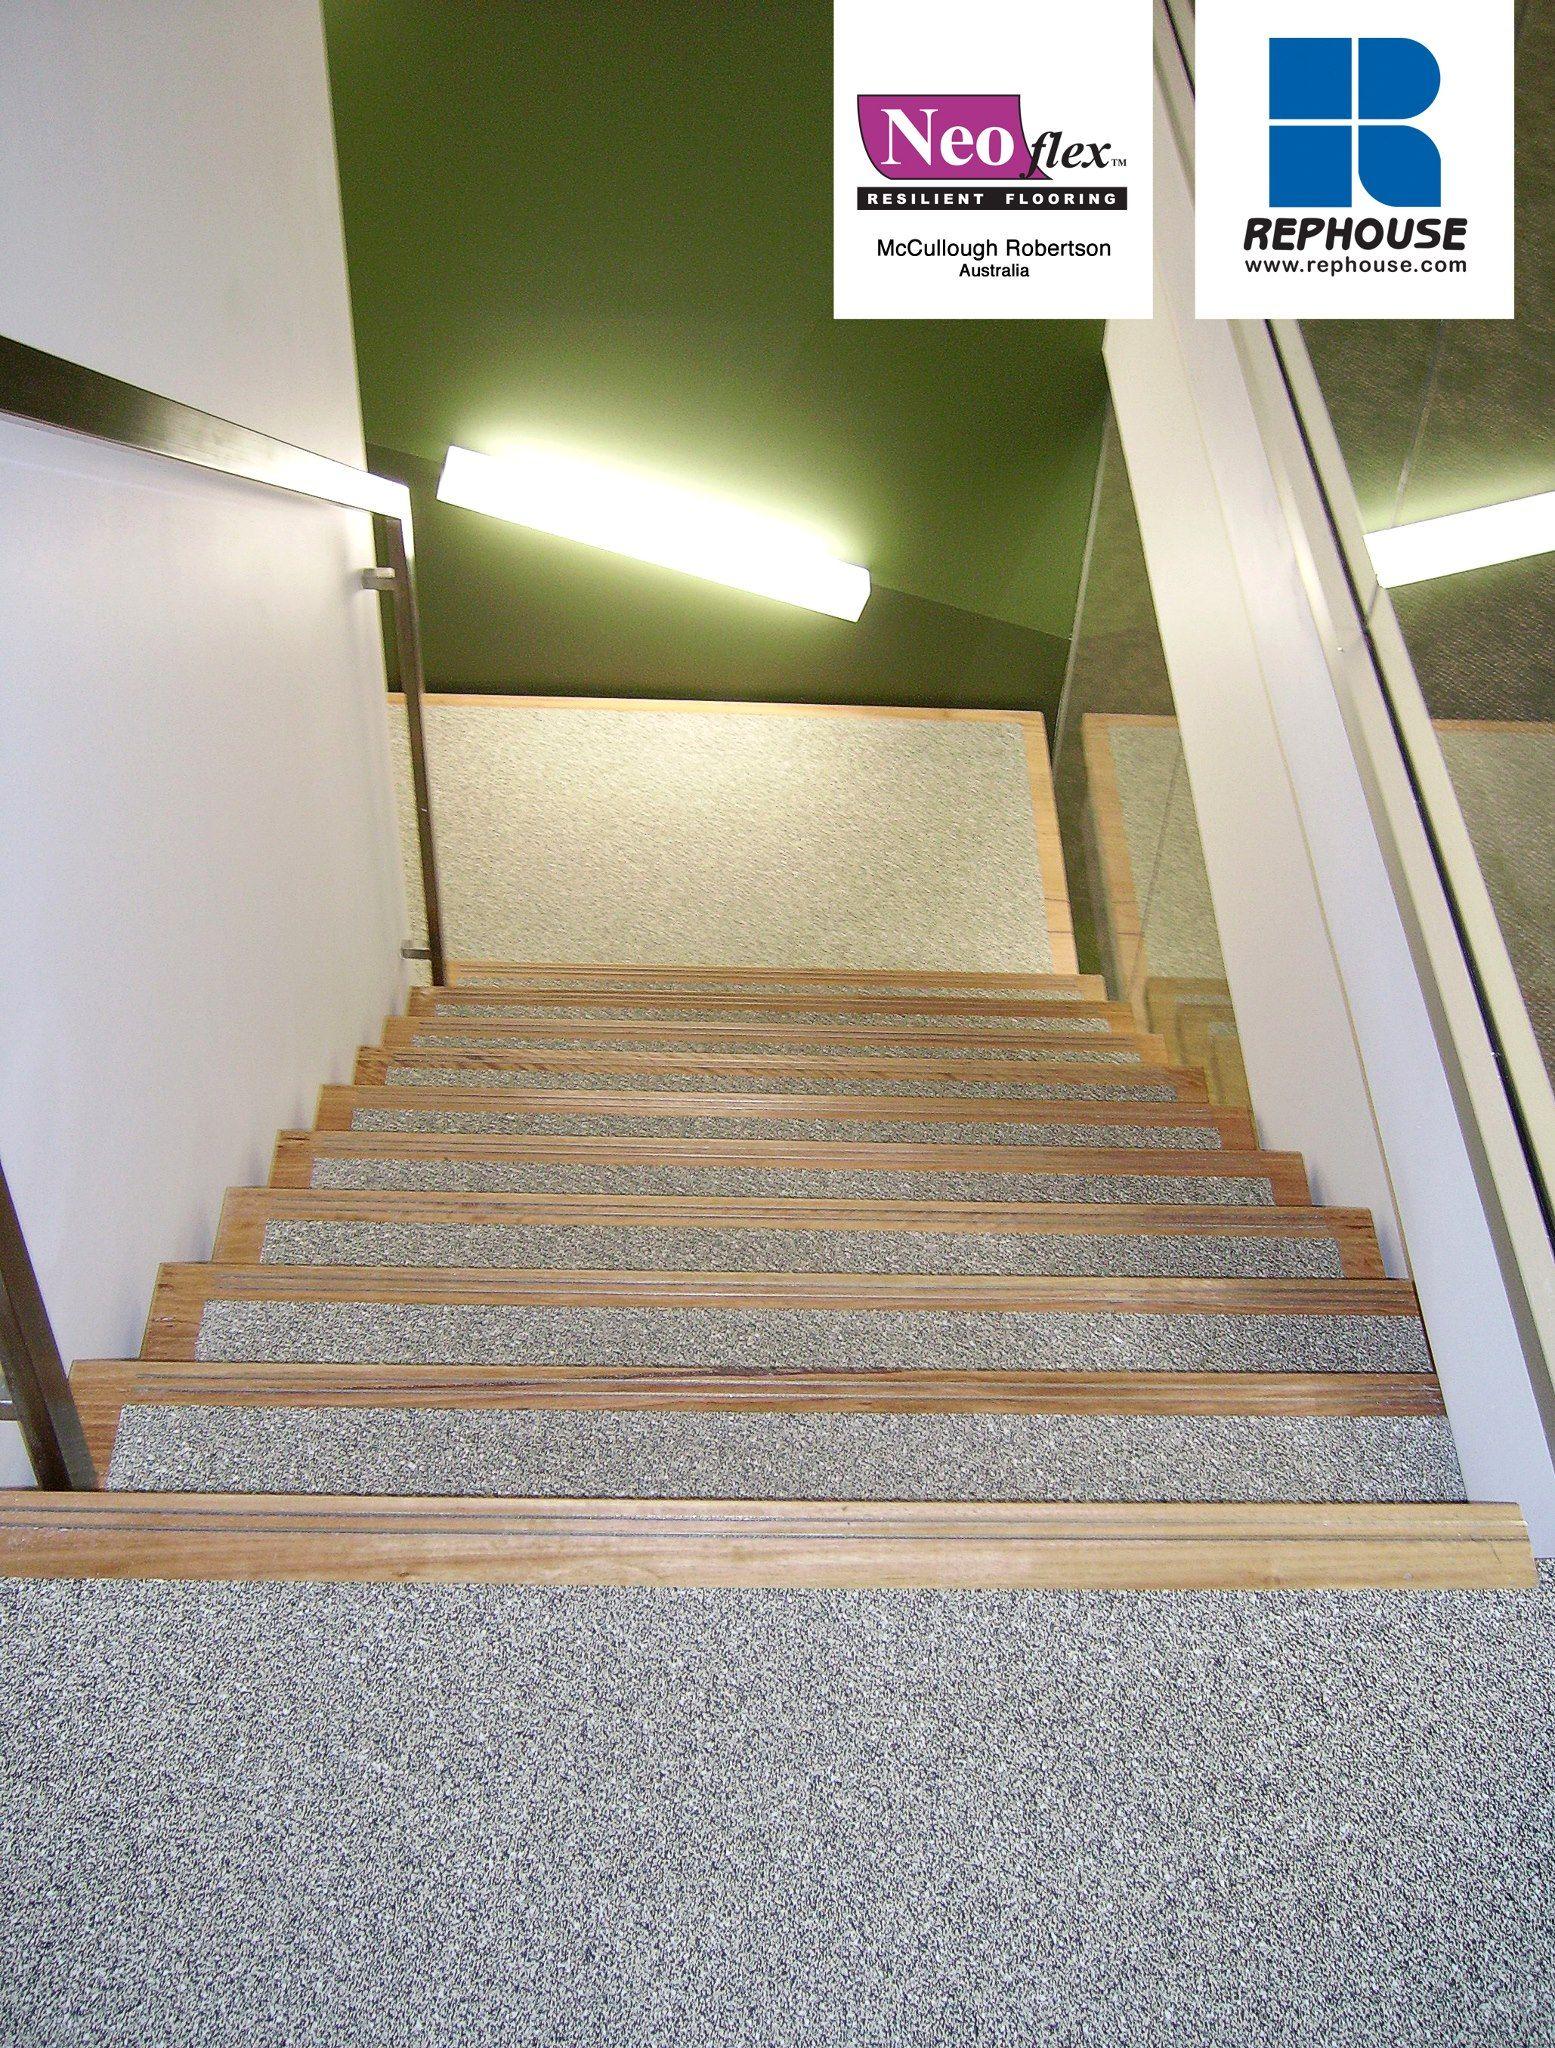 Neoflex 700 series commercial rubber flooring mccullough neoflex 700 series commercial rubber flooring mccullough robertson lawyers australia doublecrazyfo Images